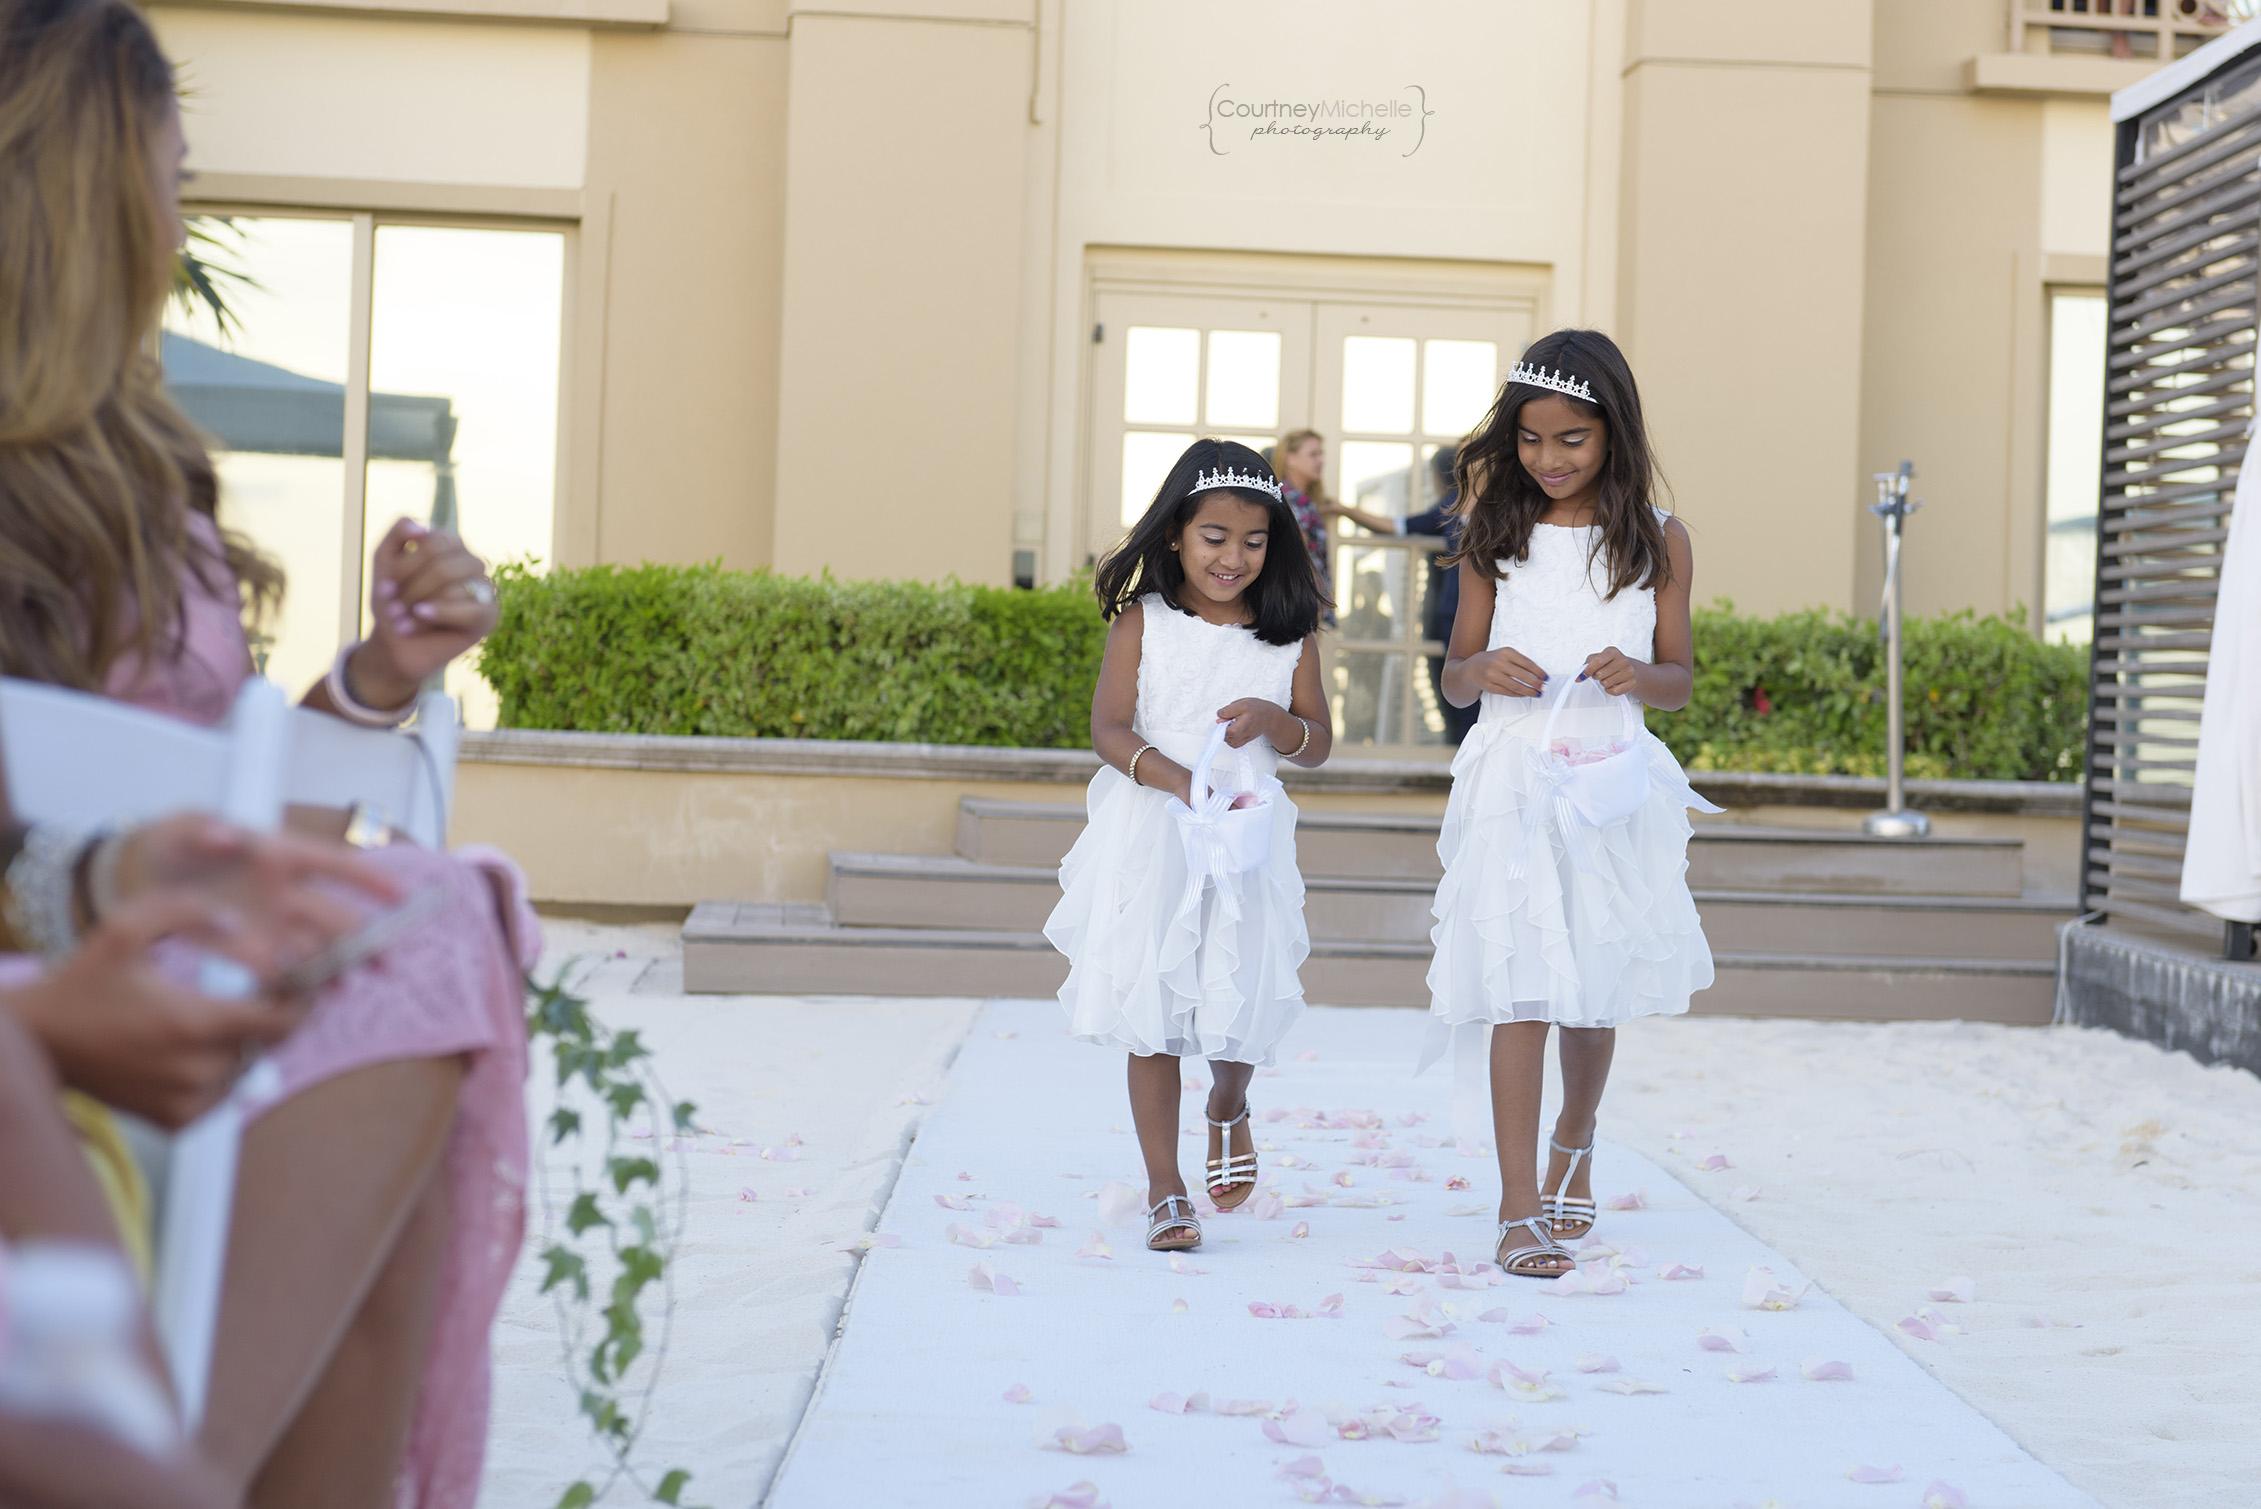 flower-girls-grand-cayman-beach-wedding-photography-by-courtney-laper©CopyrightCMP-LeaAnneRaj-7691.jpg